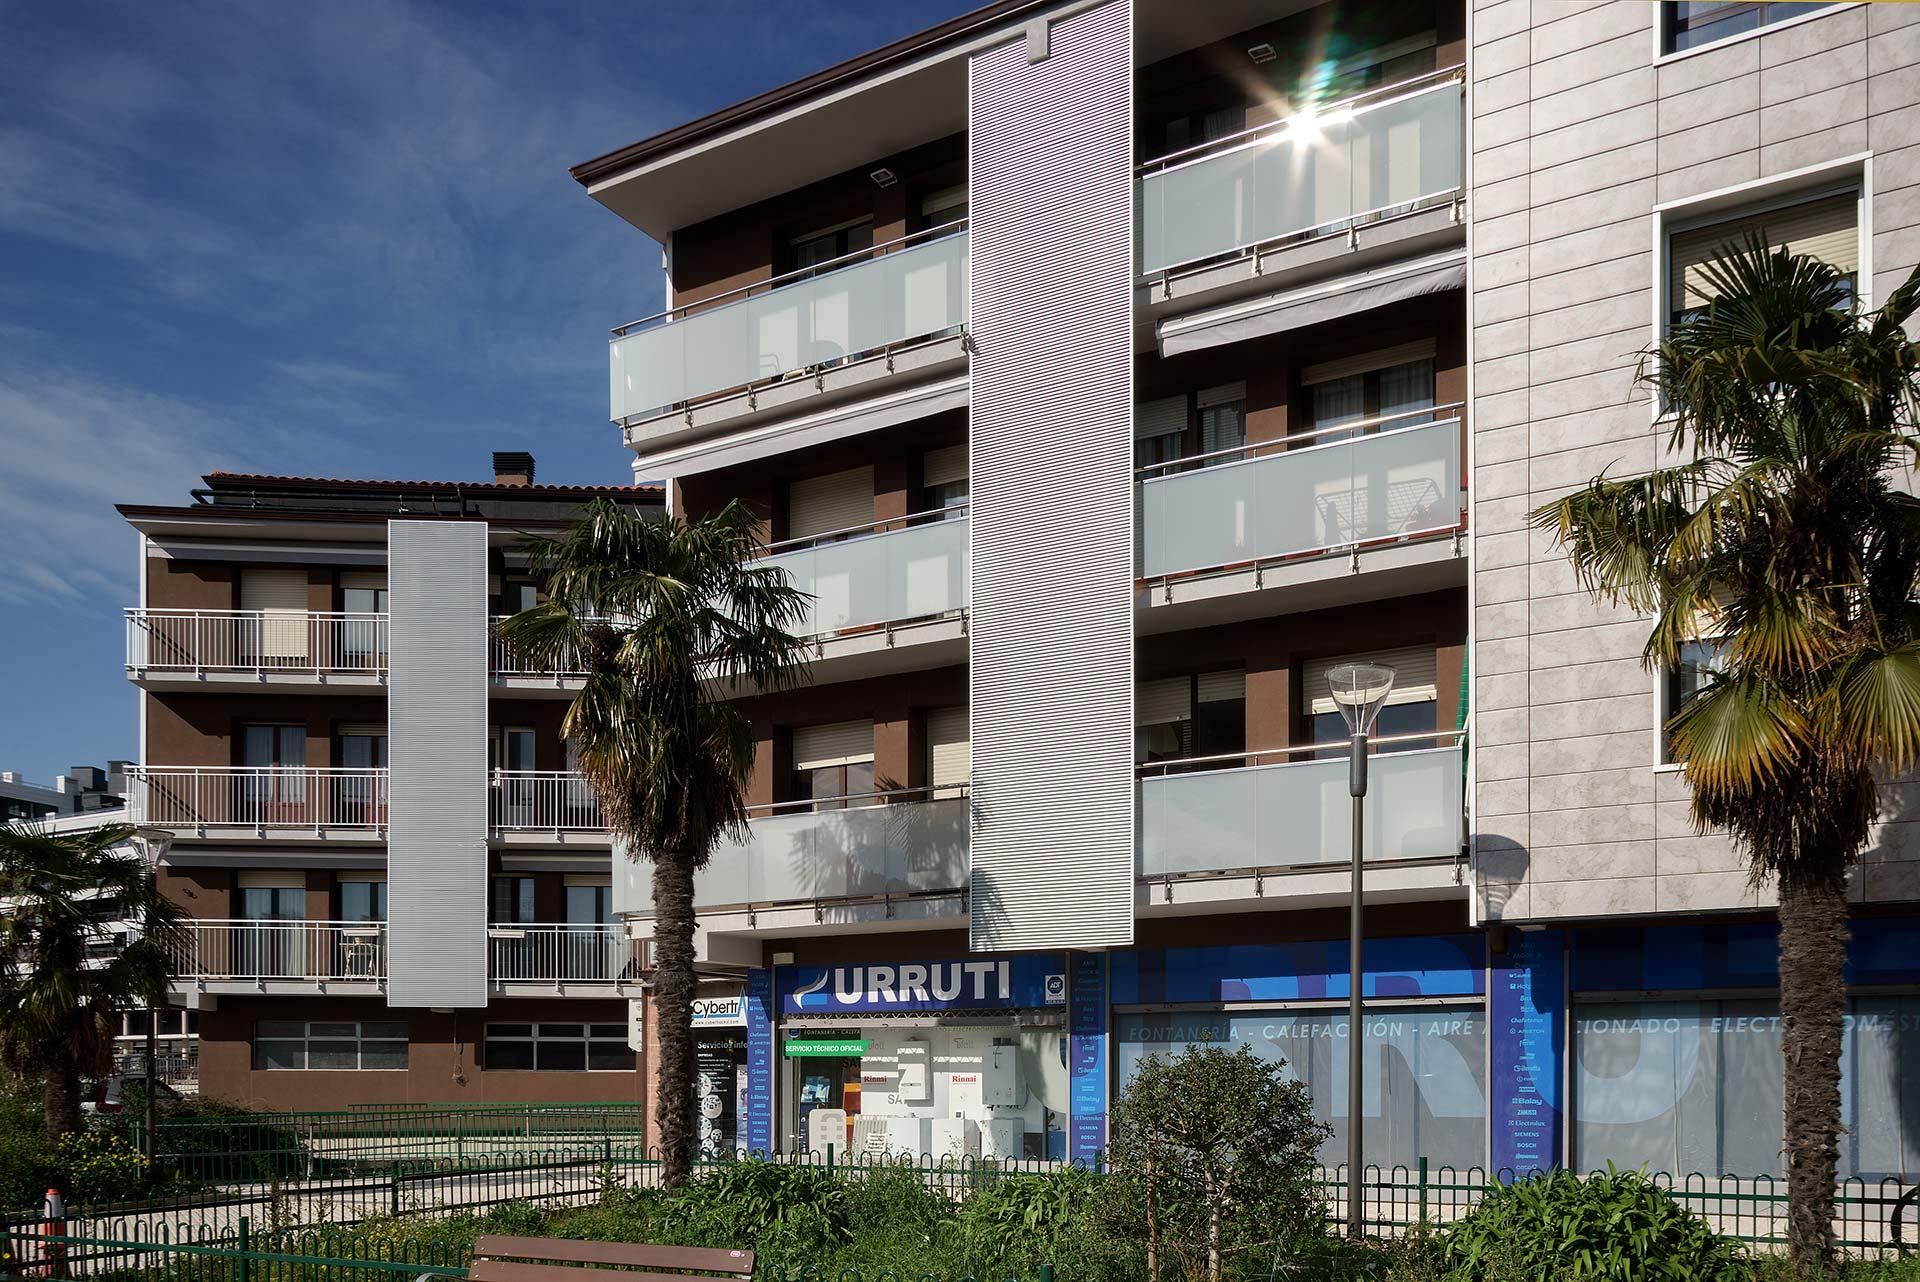 Rehabilitacion-energetica-fachada_aislamiento_District-Heating_BASA-Arquitectura_San-Sebastian-Donosti_1_b